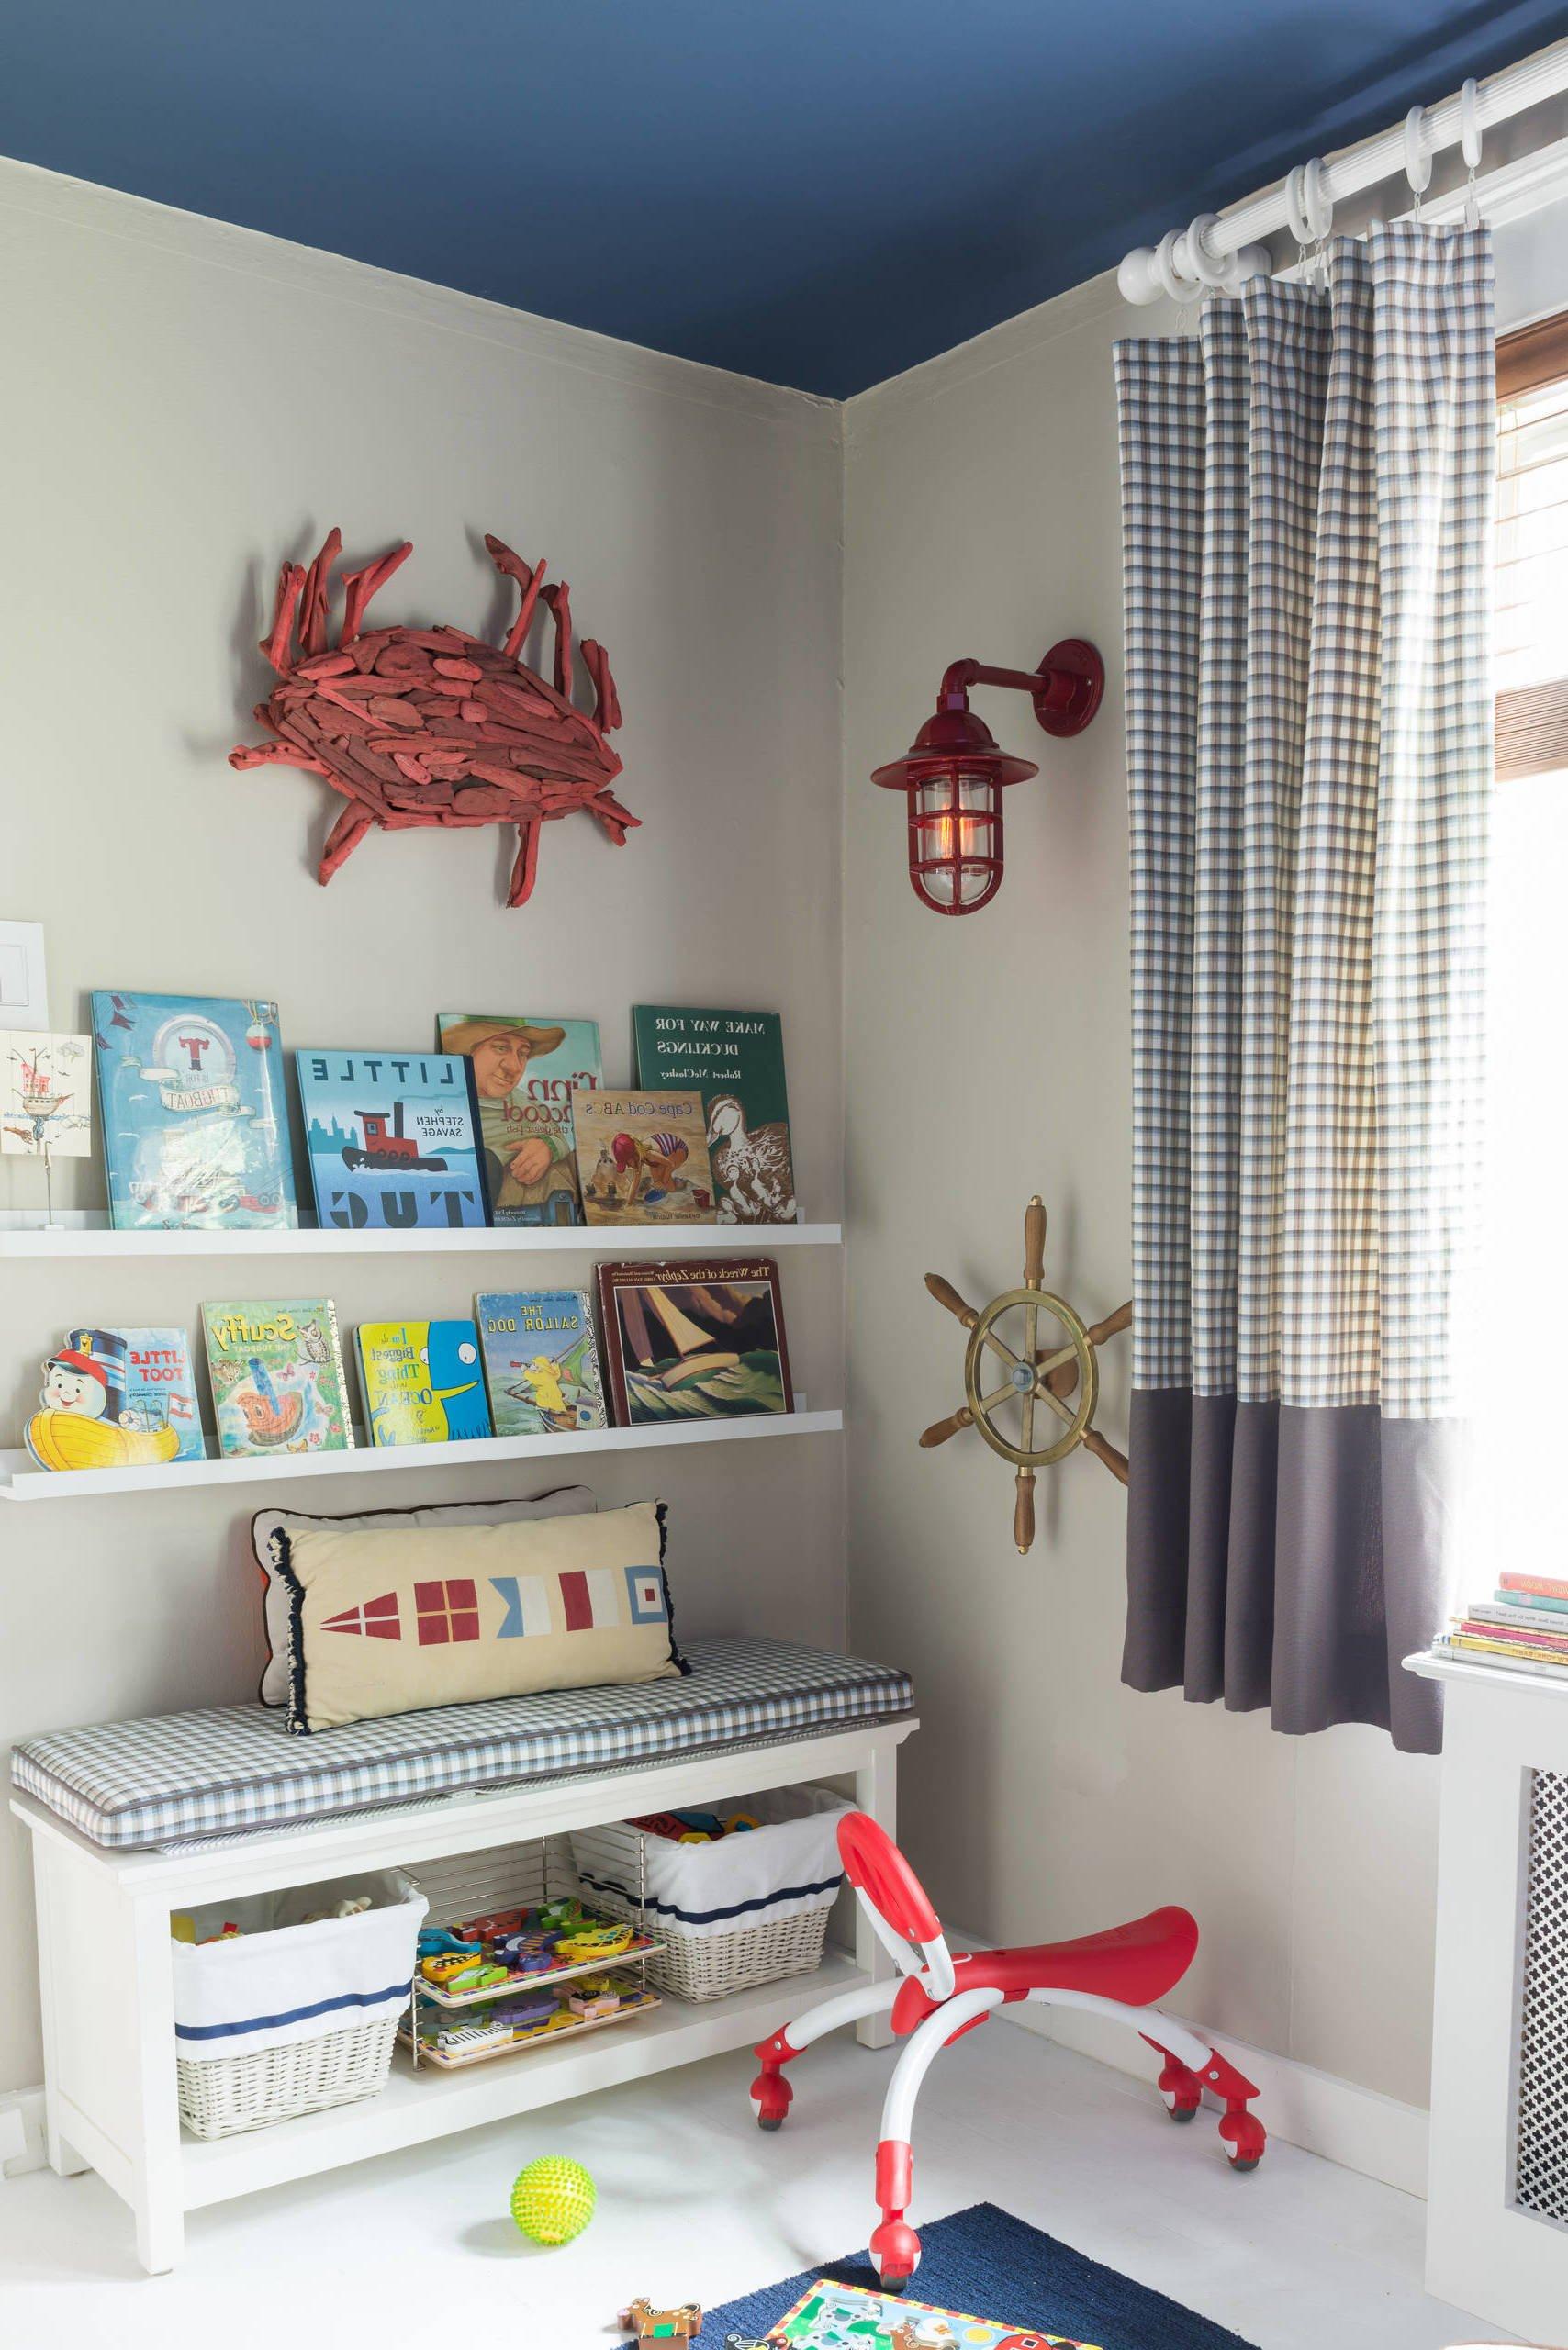 Kinderzimmer Wandgestaltung Ideen selber machen